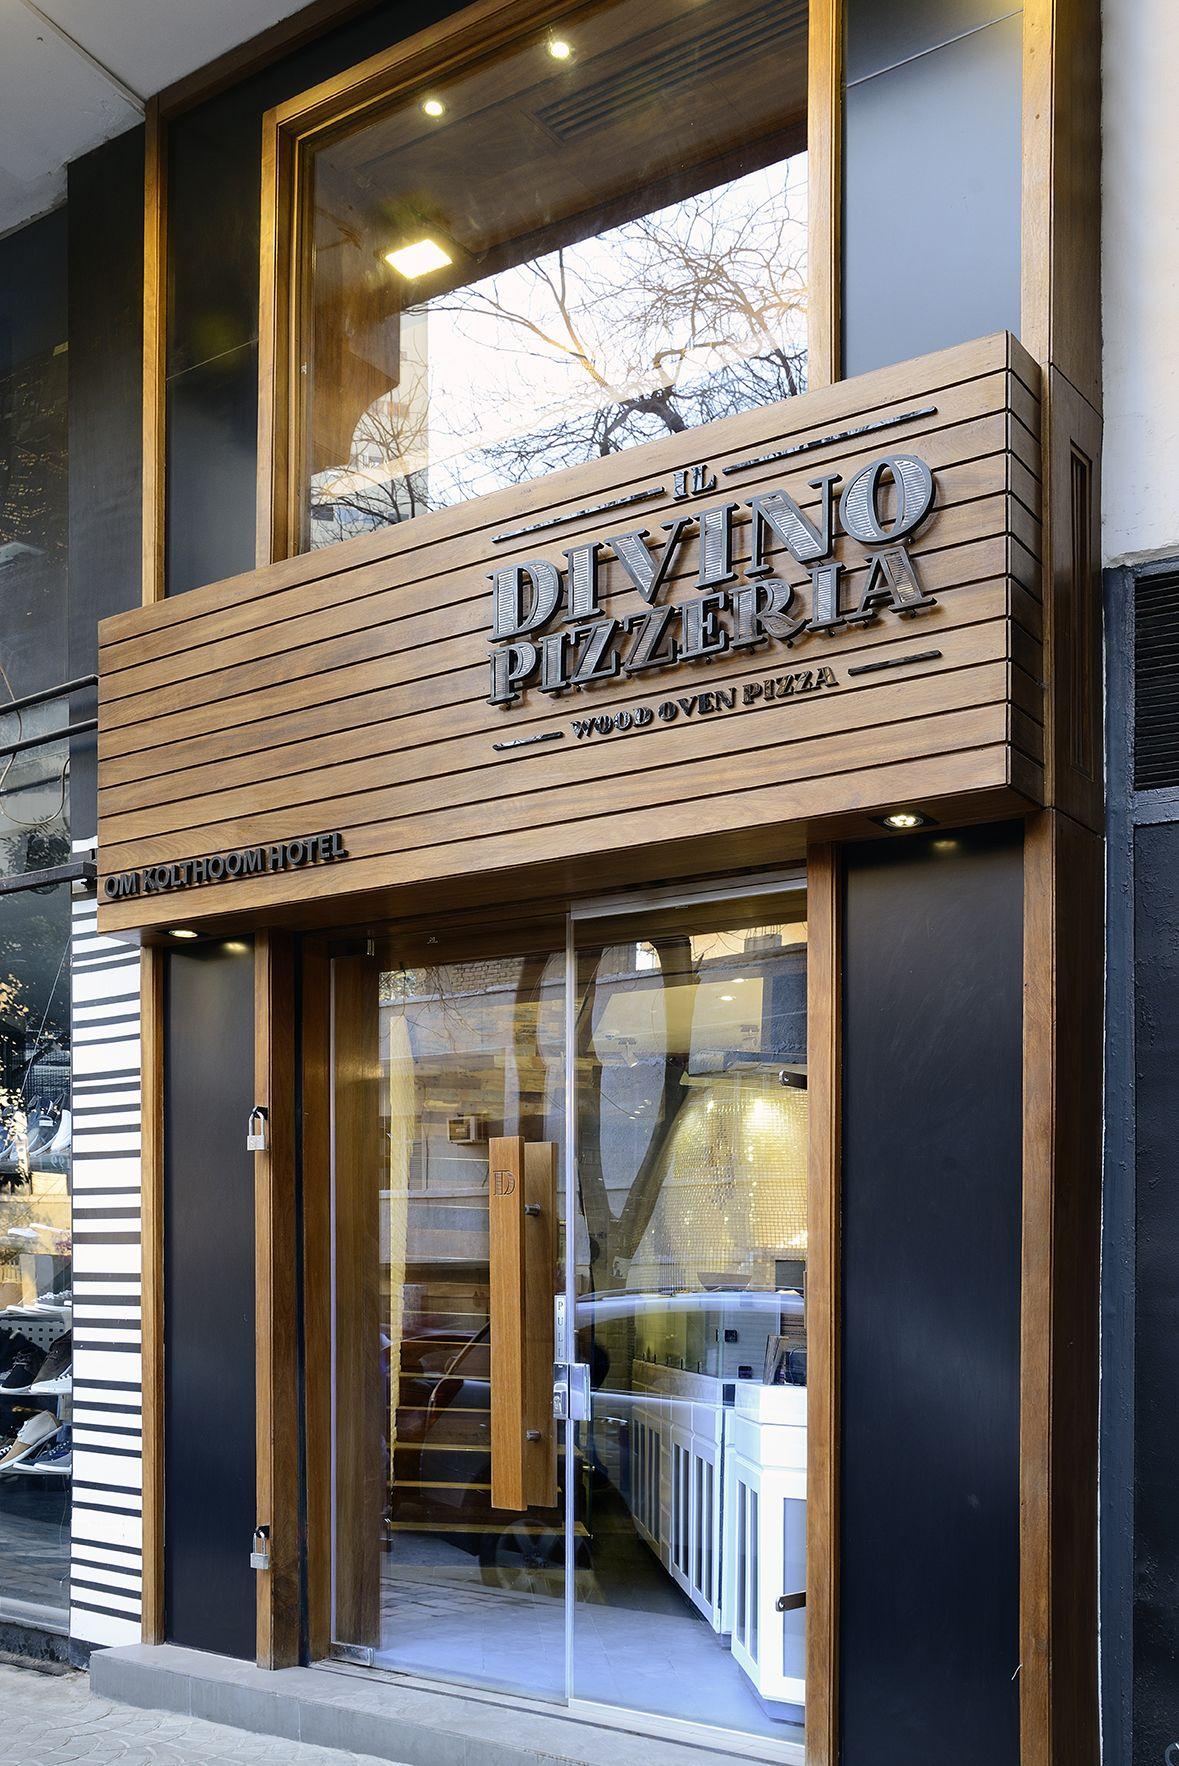 Pin by Eklego Design on il Divino Pizzeria Glass